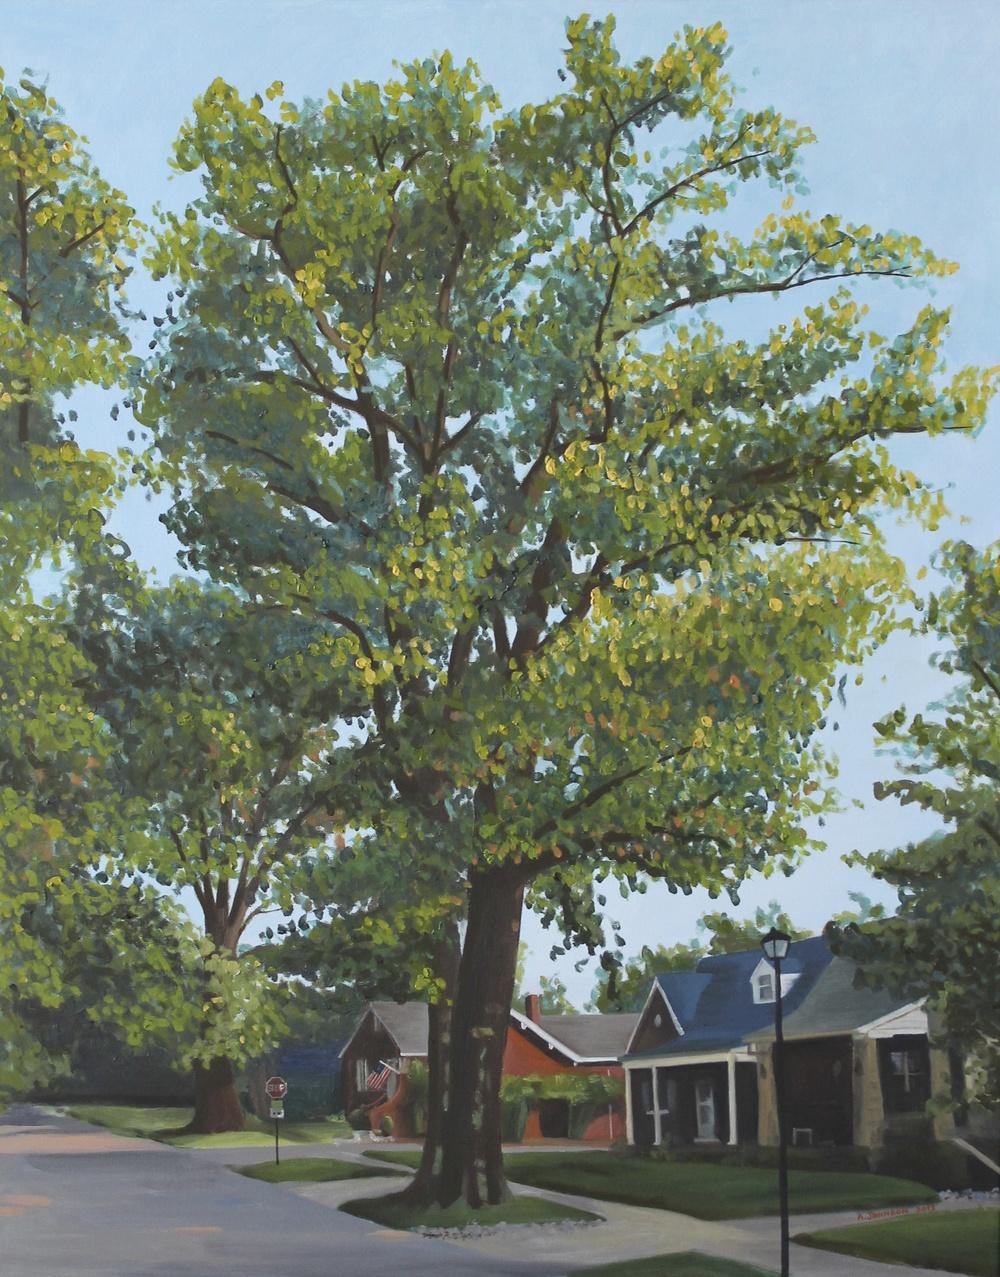 blaineproposaltree.jpg